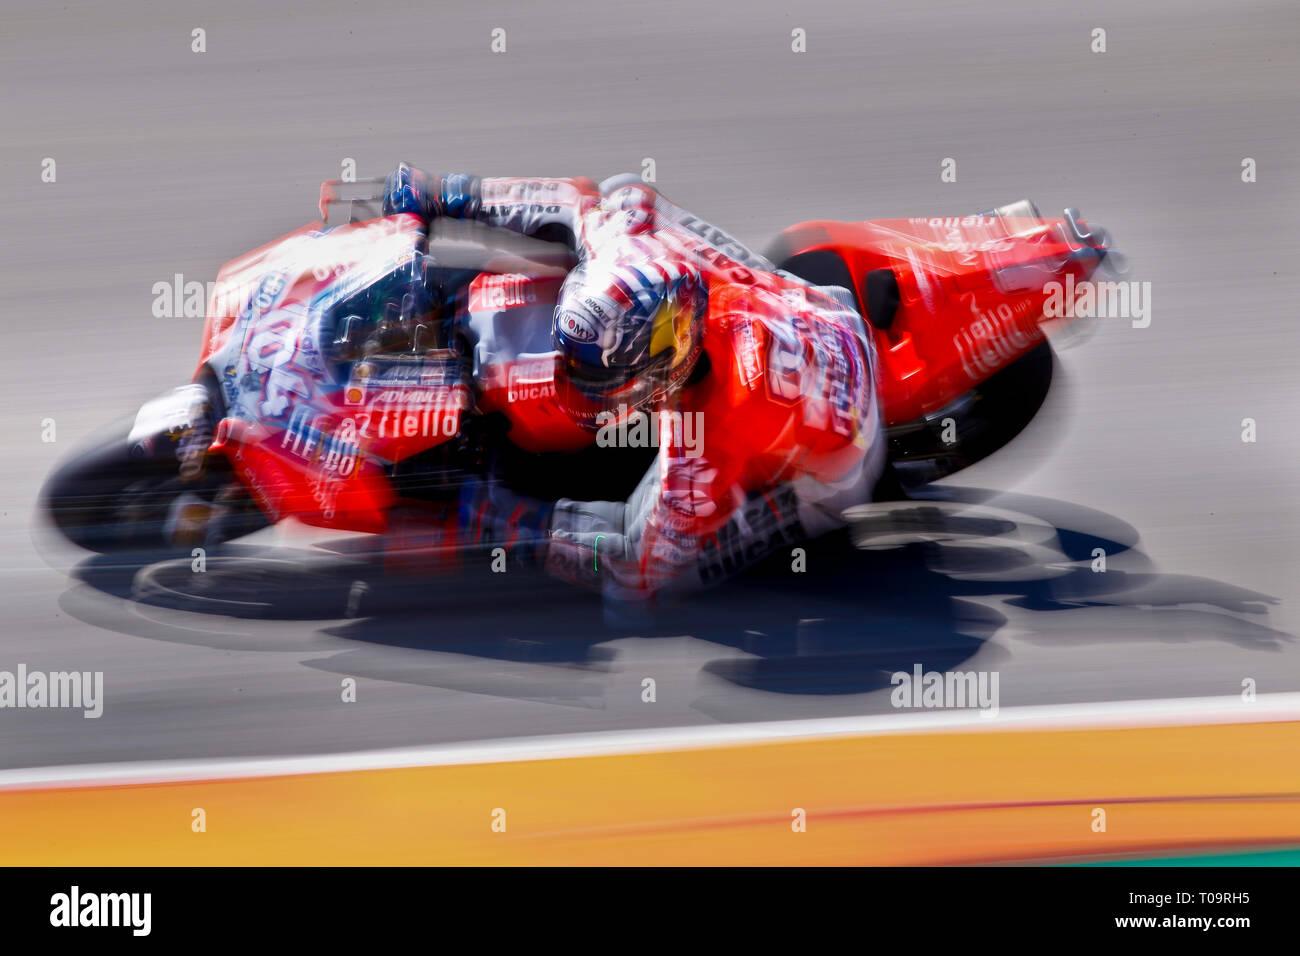 Andrea Dovizioso (ITA) of Ducati Team, MotoGP World Championship 2018, Pramac Motorrad Grand Prix Deutschland, Sachsenring, Germany on July 14th 2018 - Stock Image